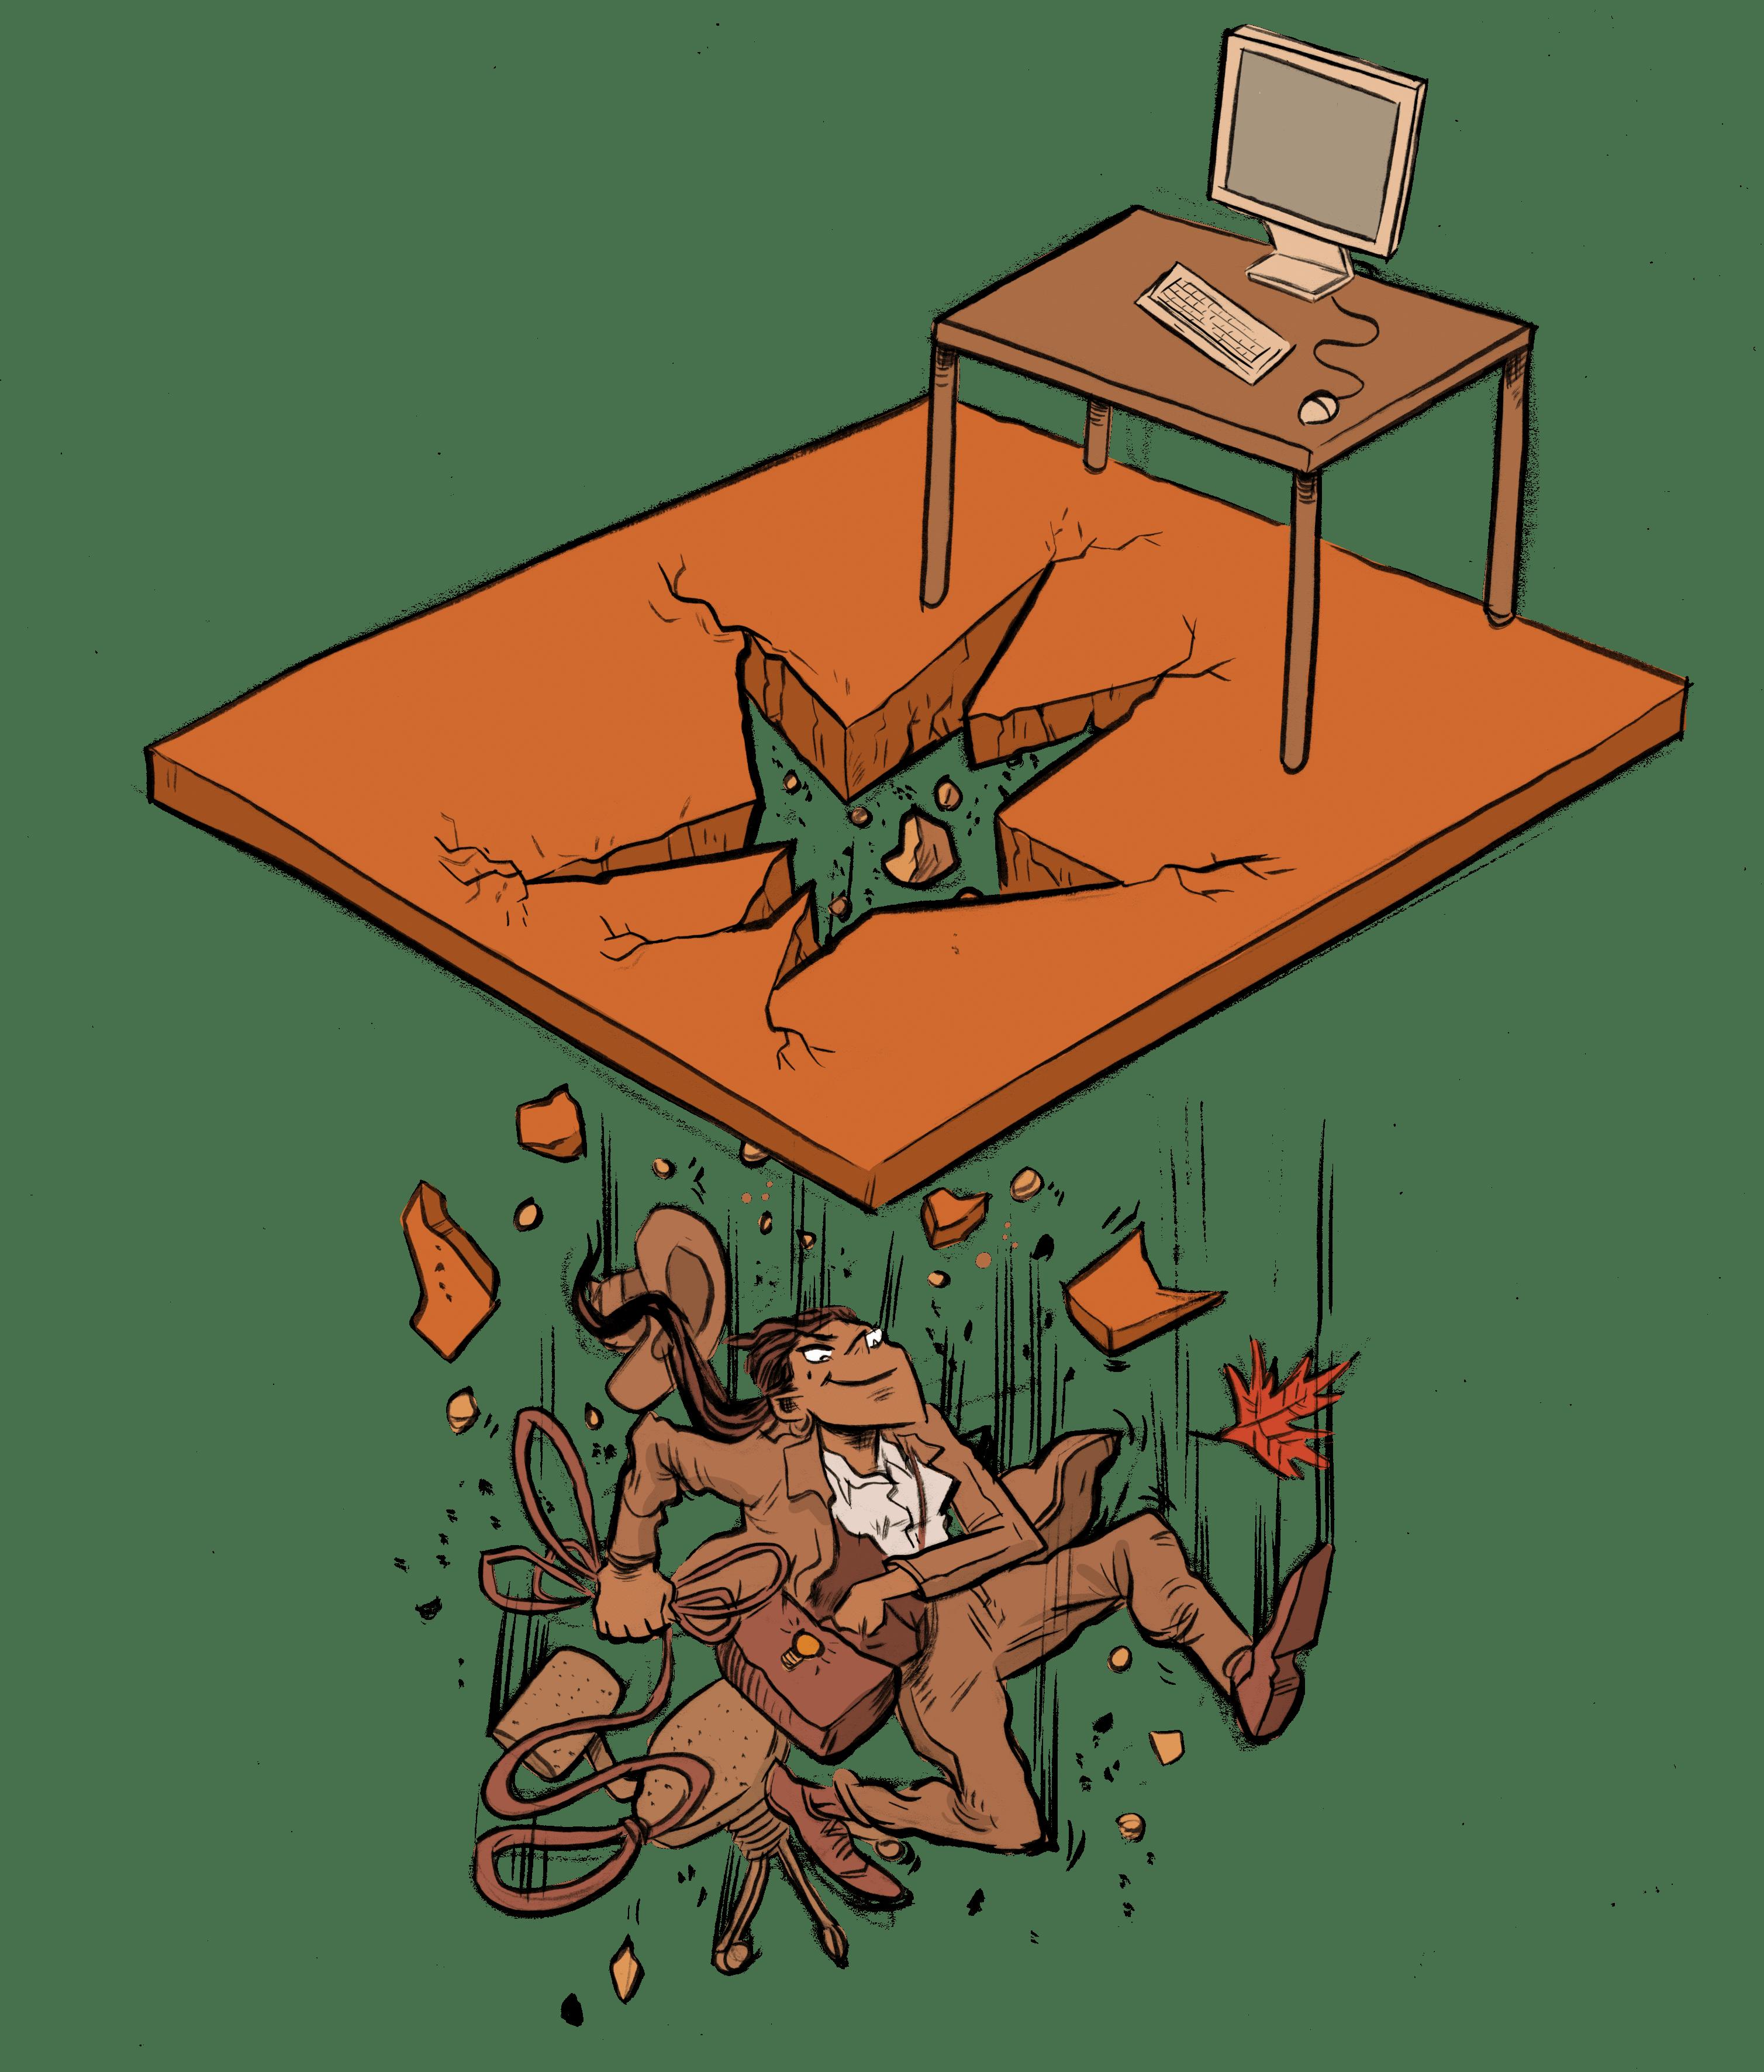 Surviving a financial catastrophe